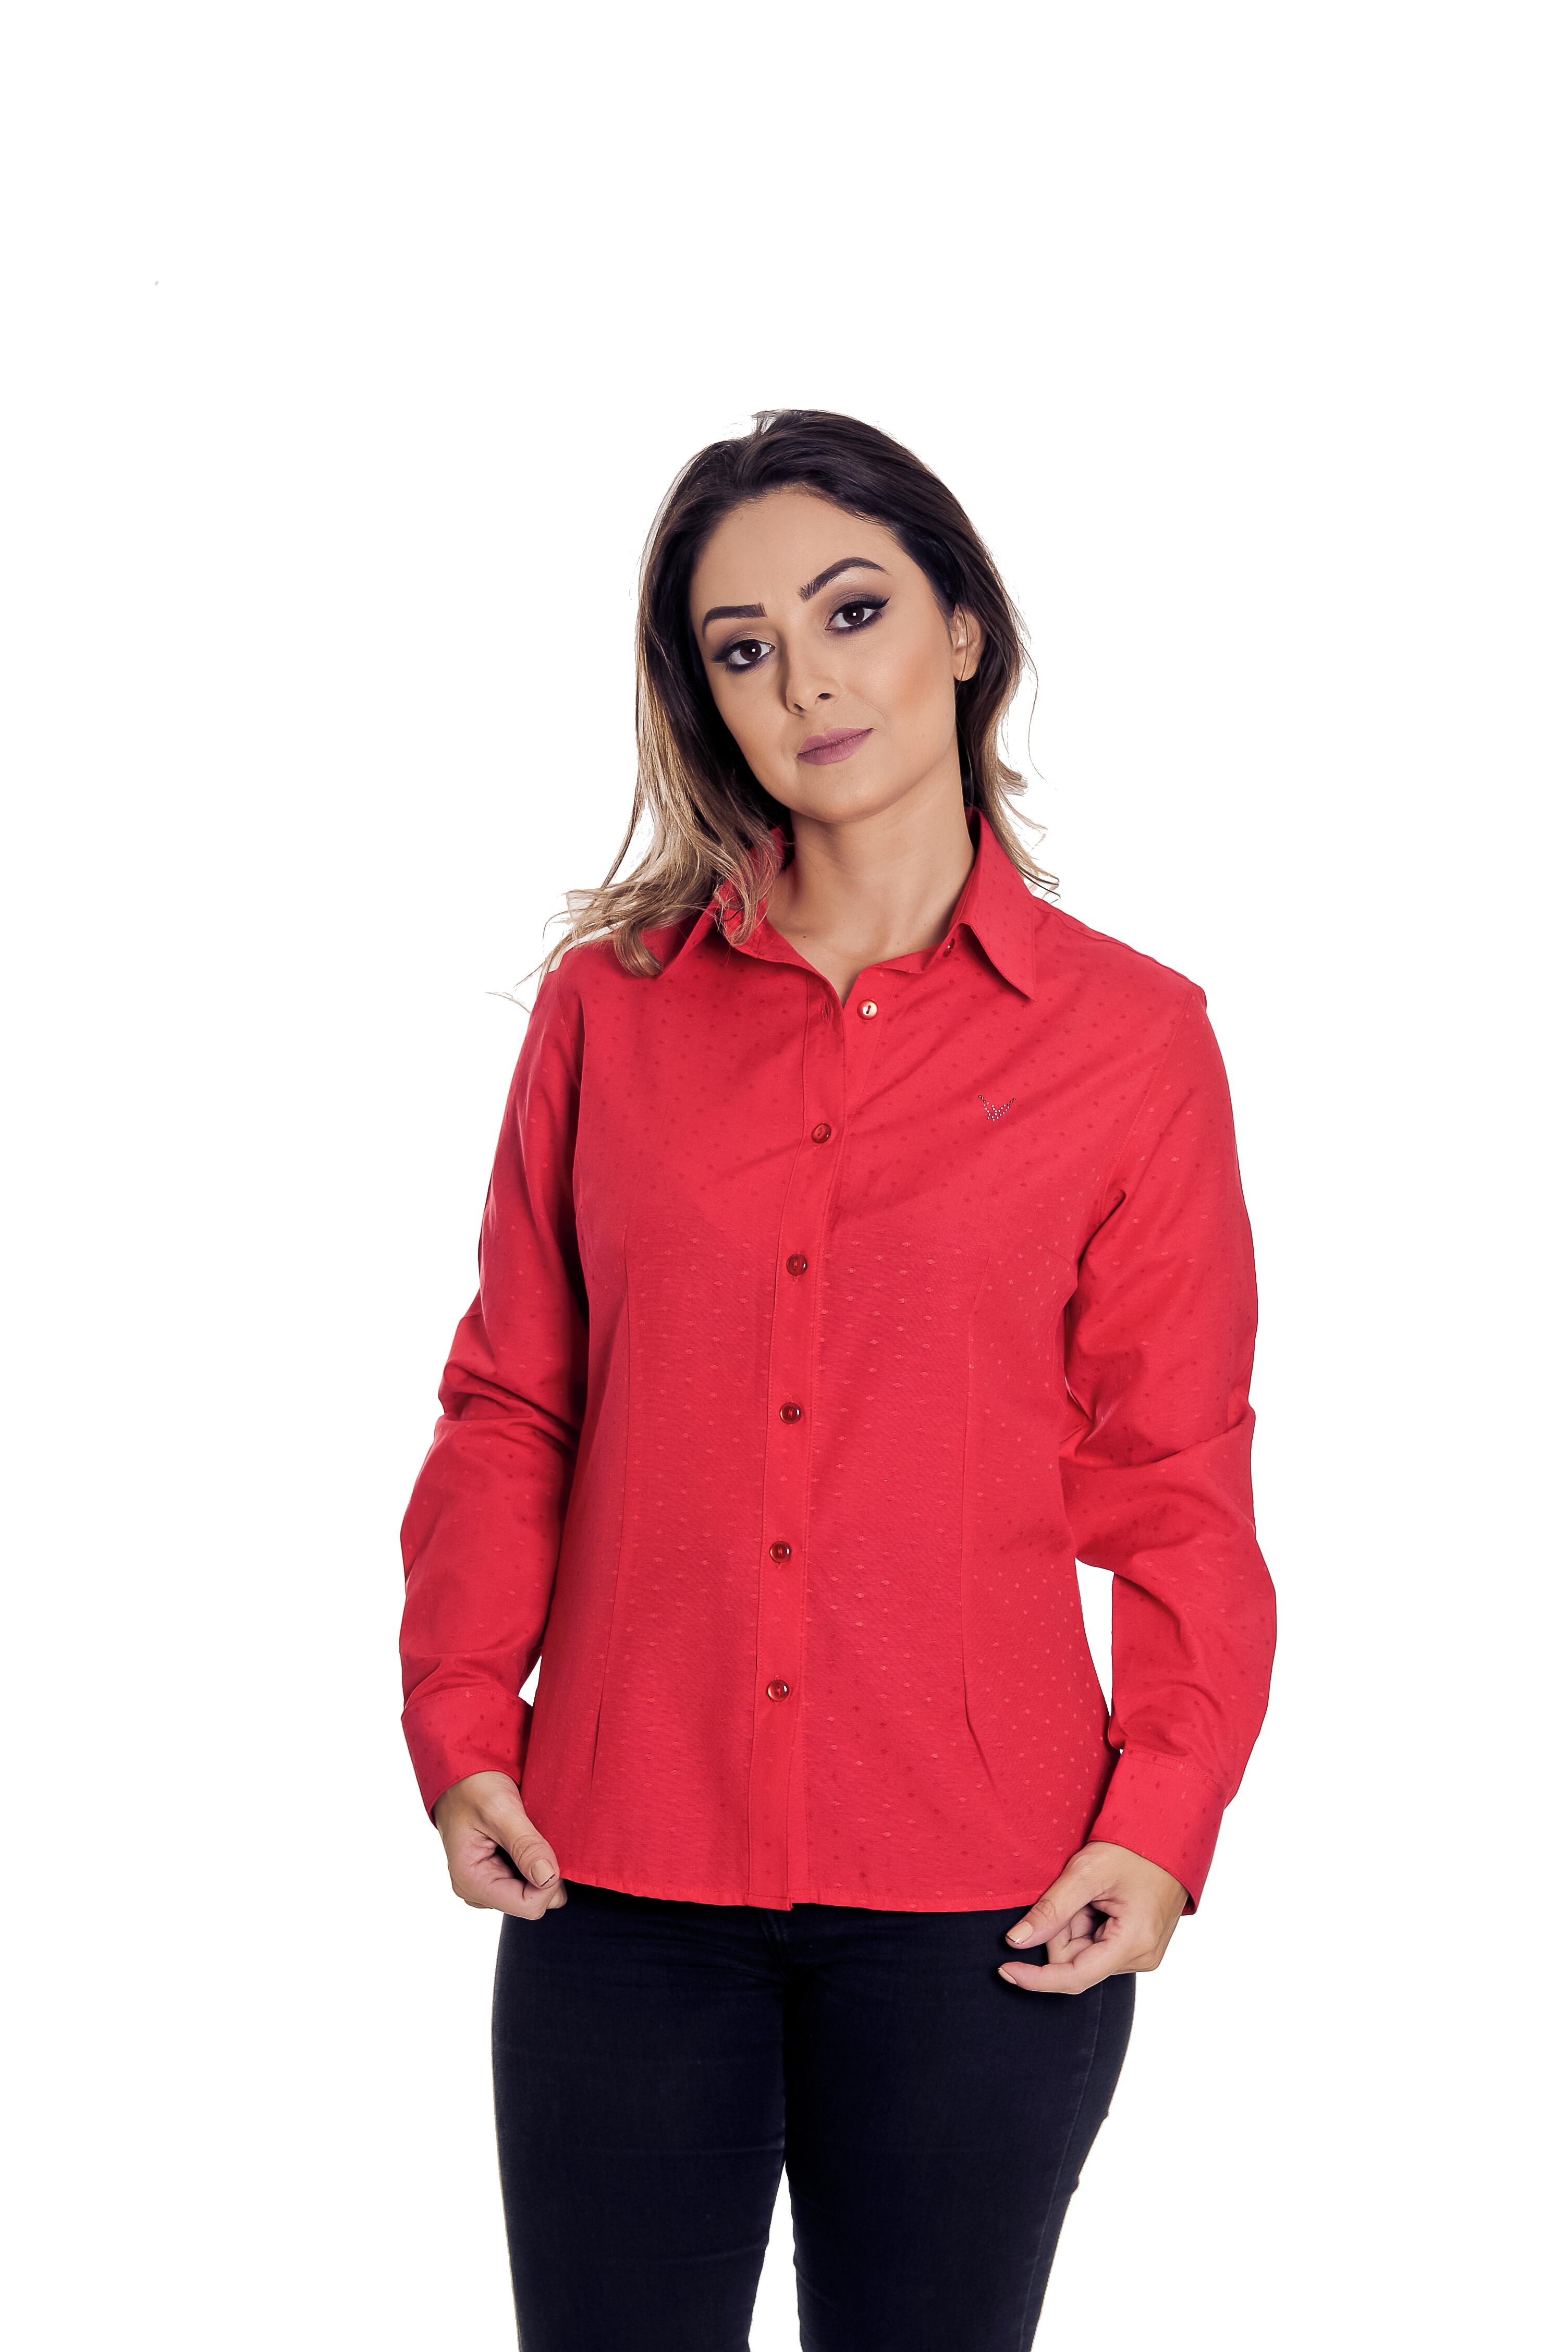 Camisa Feminina Etieneflor Pimentarosada  06a5285d68526